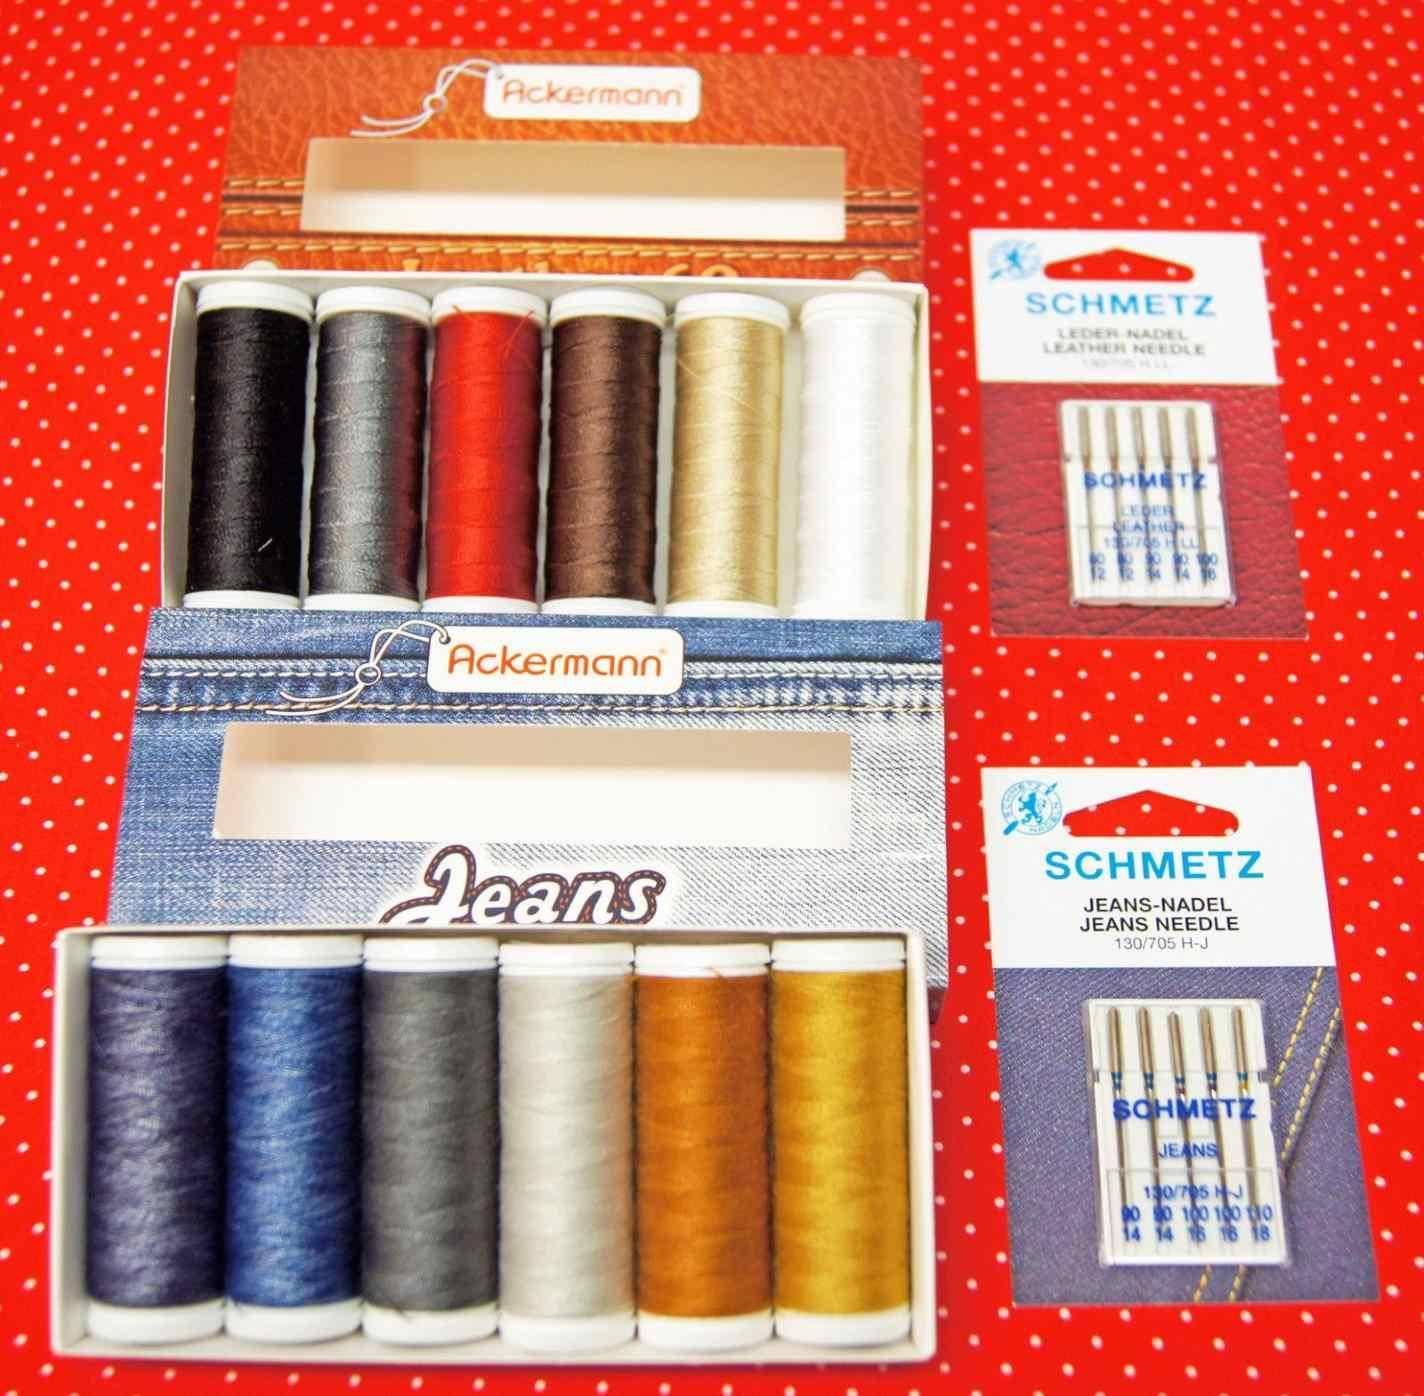 391089d8c408c Ackermann Jeans+Leder Garn m. Nadeln ~ CreArtista